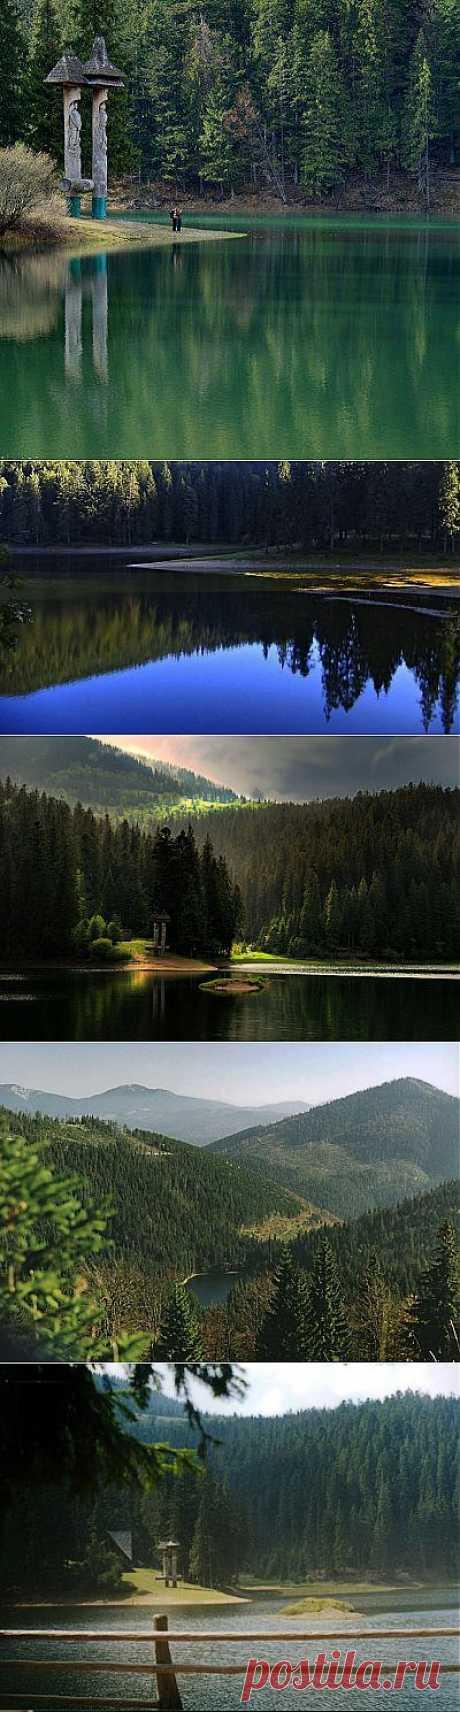 Жемчужина Карпат - озеро Синевир / Туристический спутник